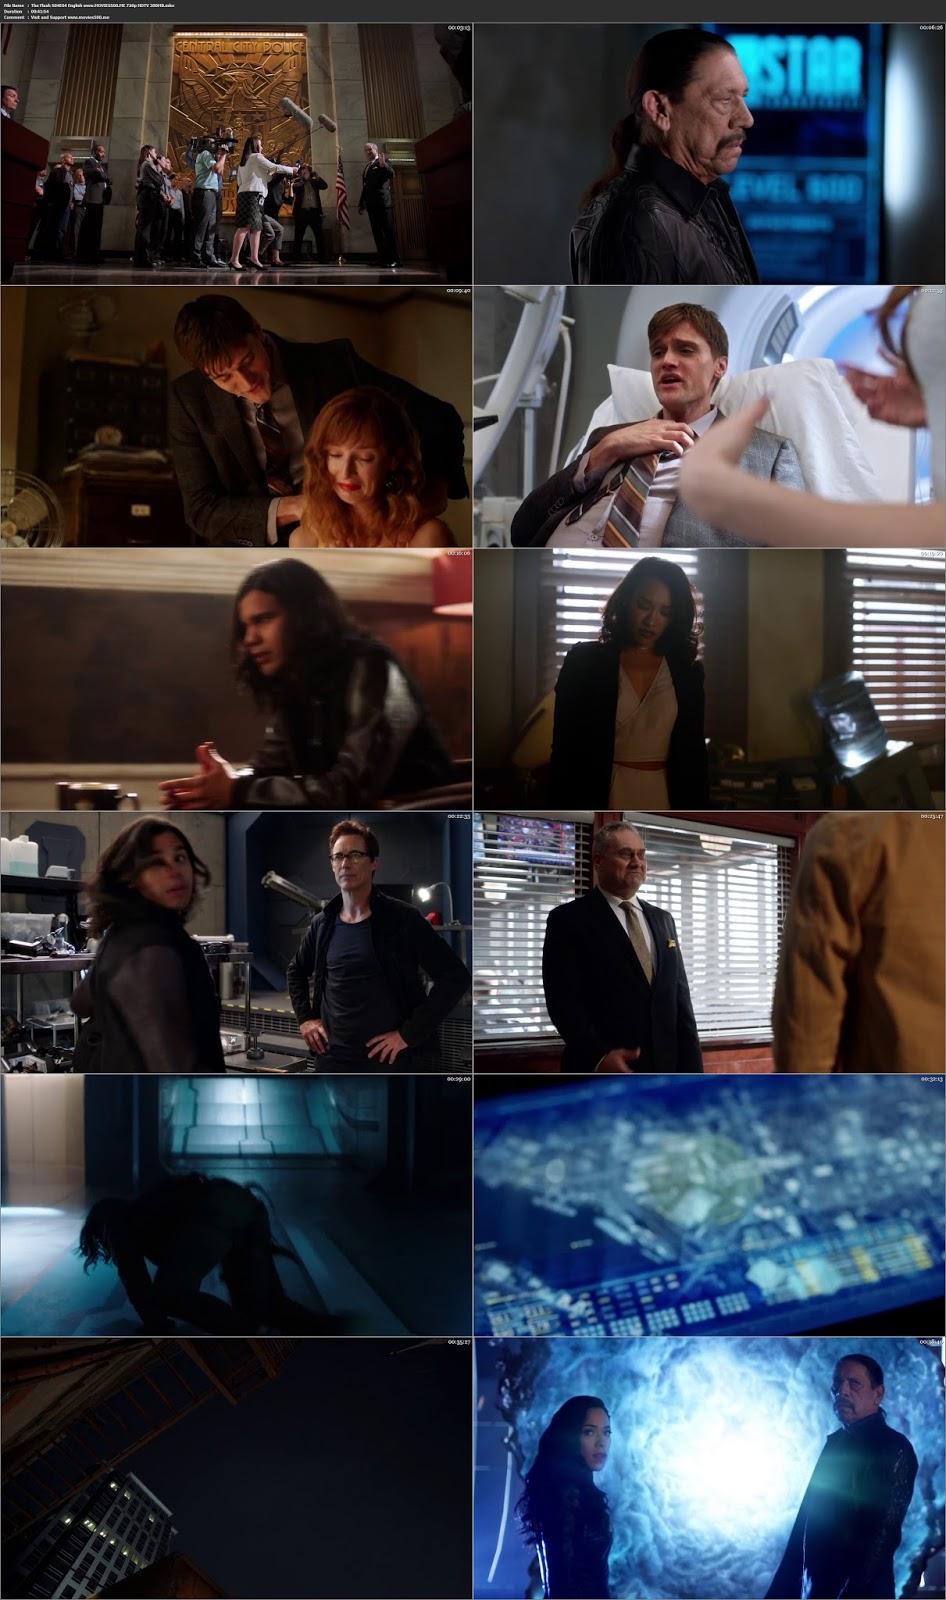 The Flash S04E04 English 325MB HDTVRip 720 at massage.company